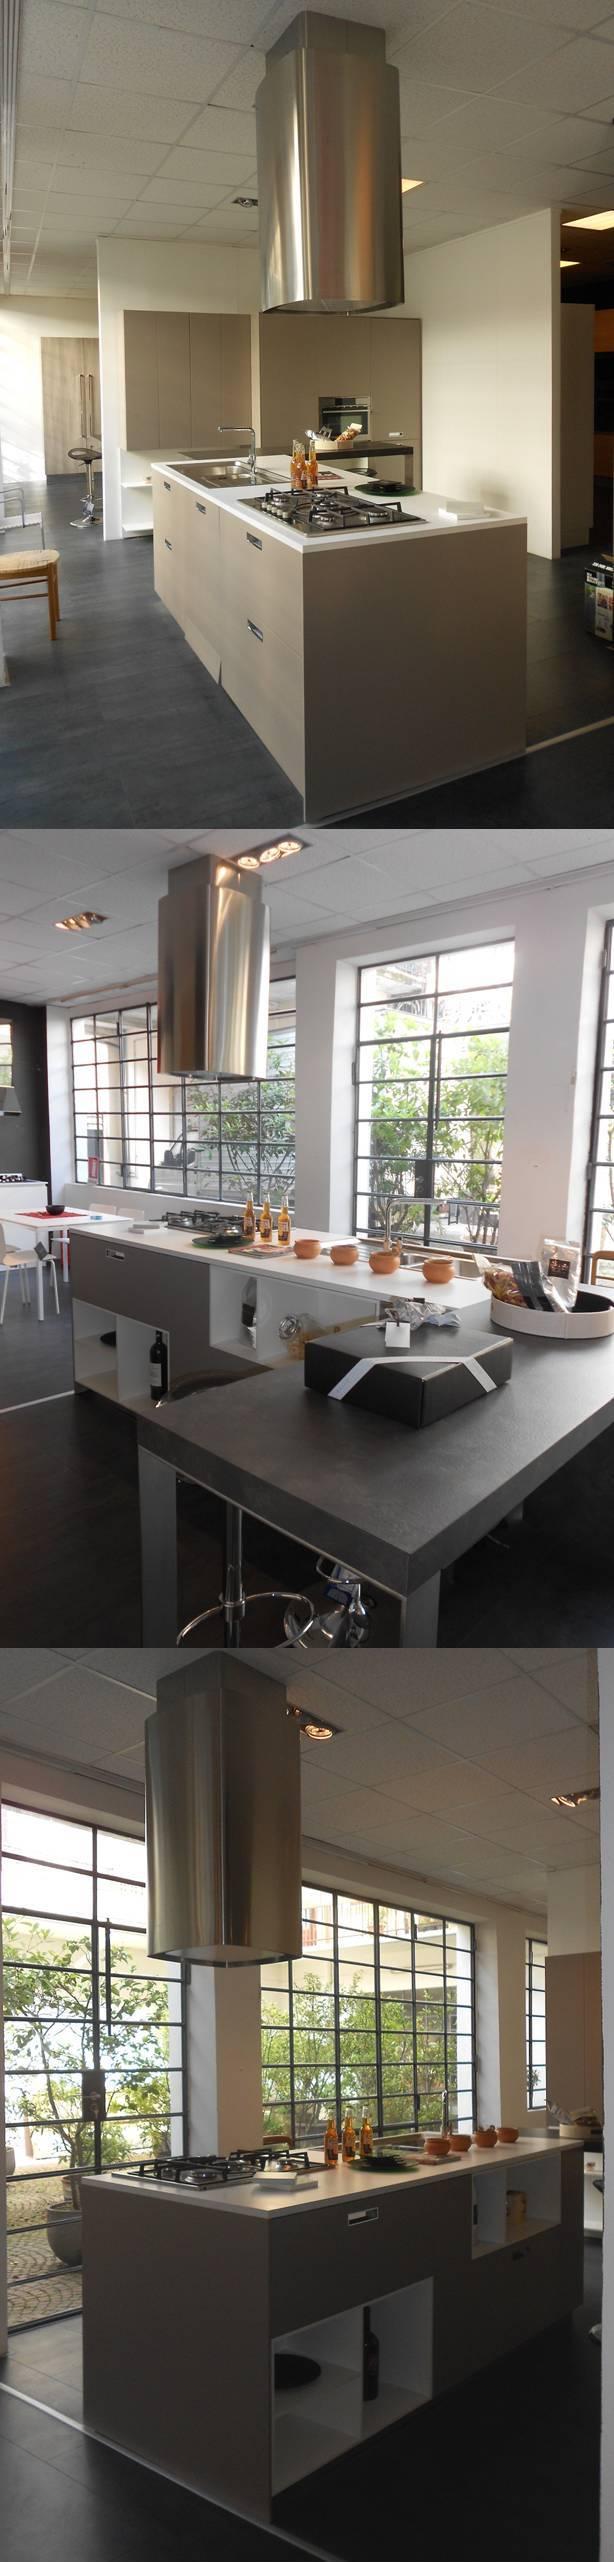 Cucina CESAR design modello KORA in finitura laminato opaco colore ...